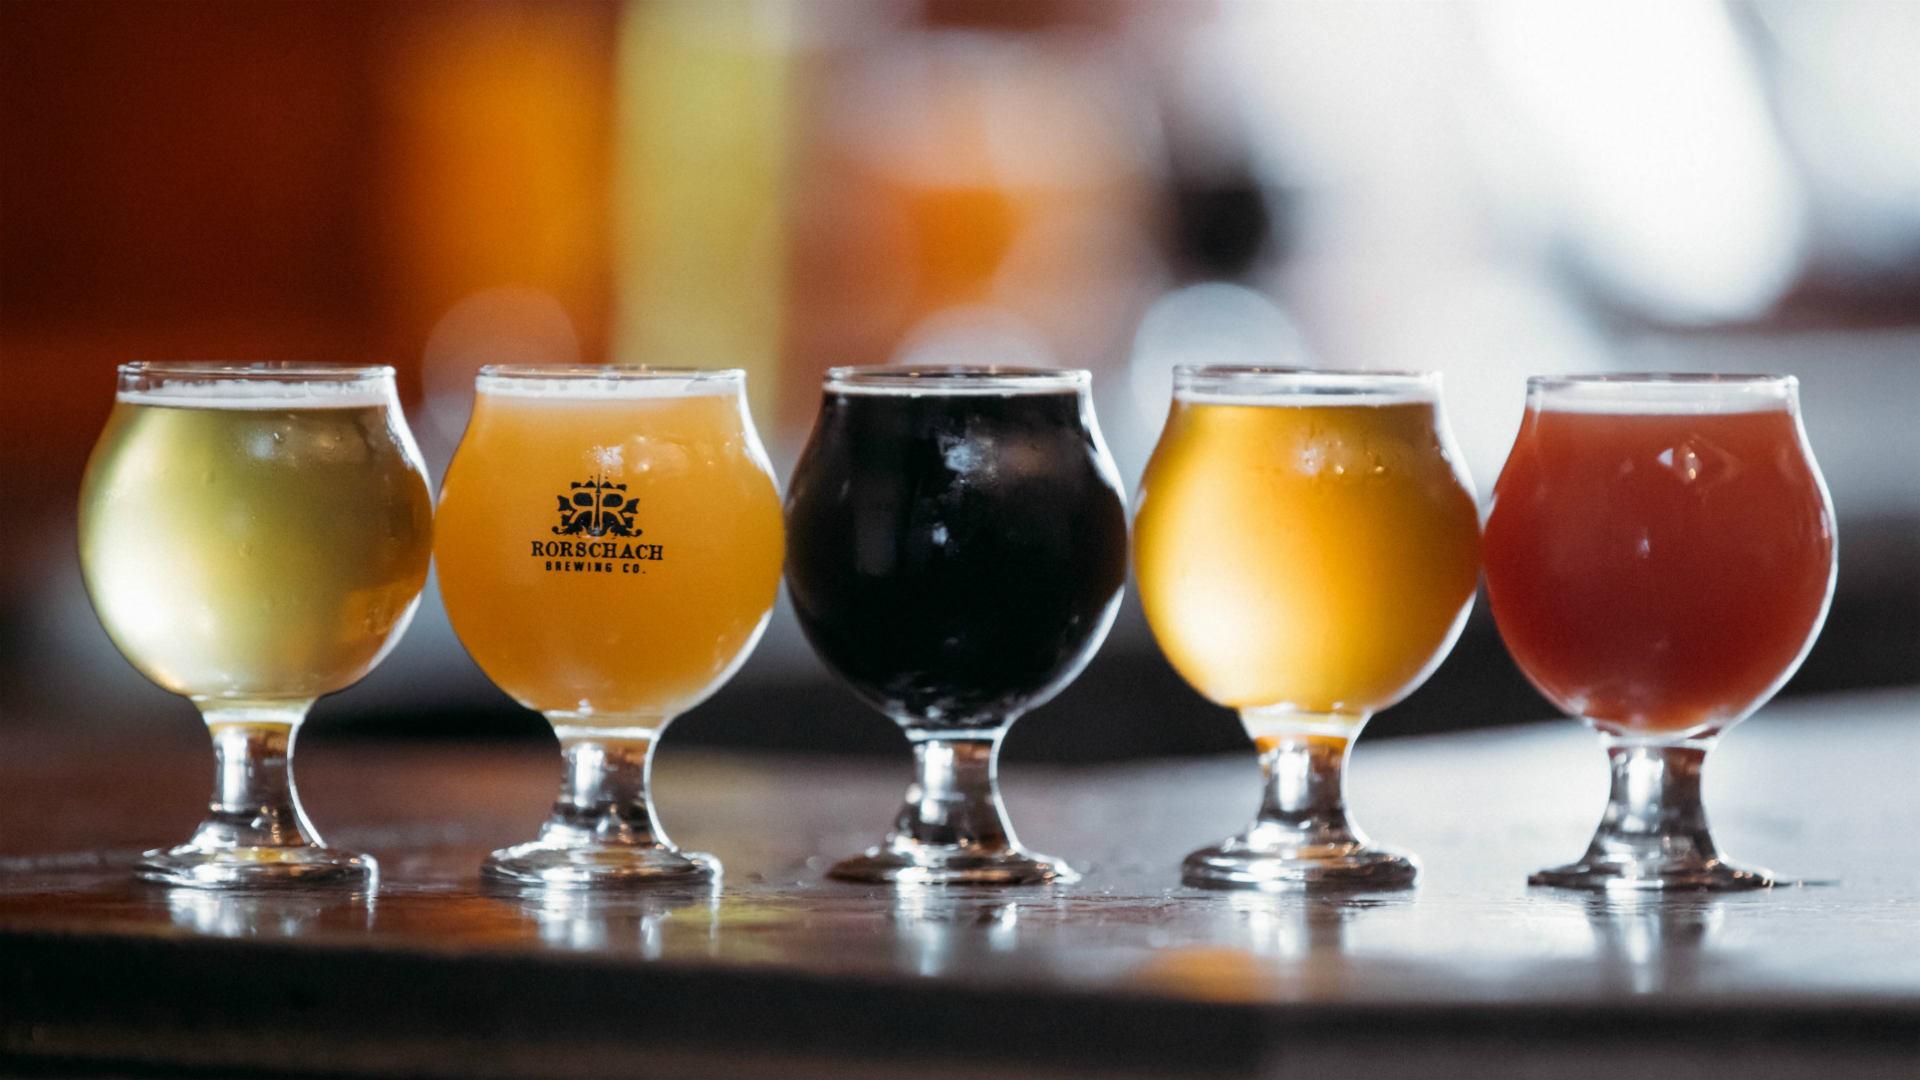 Rorschach-Brewing-Co-Beer